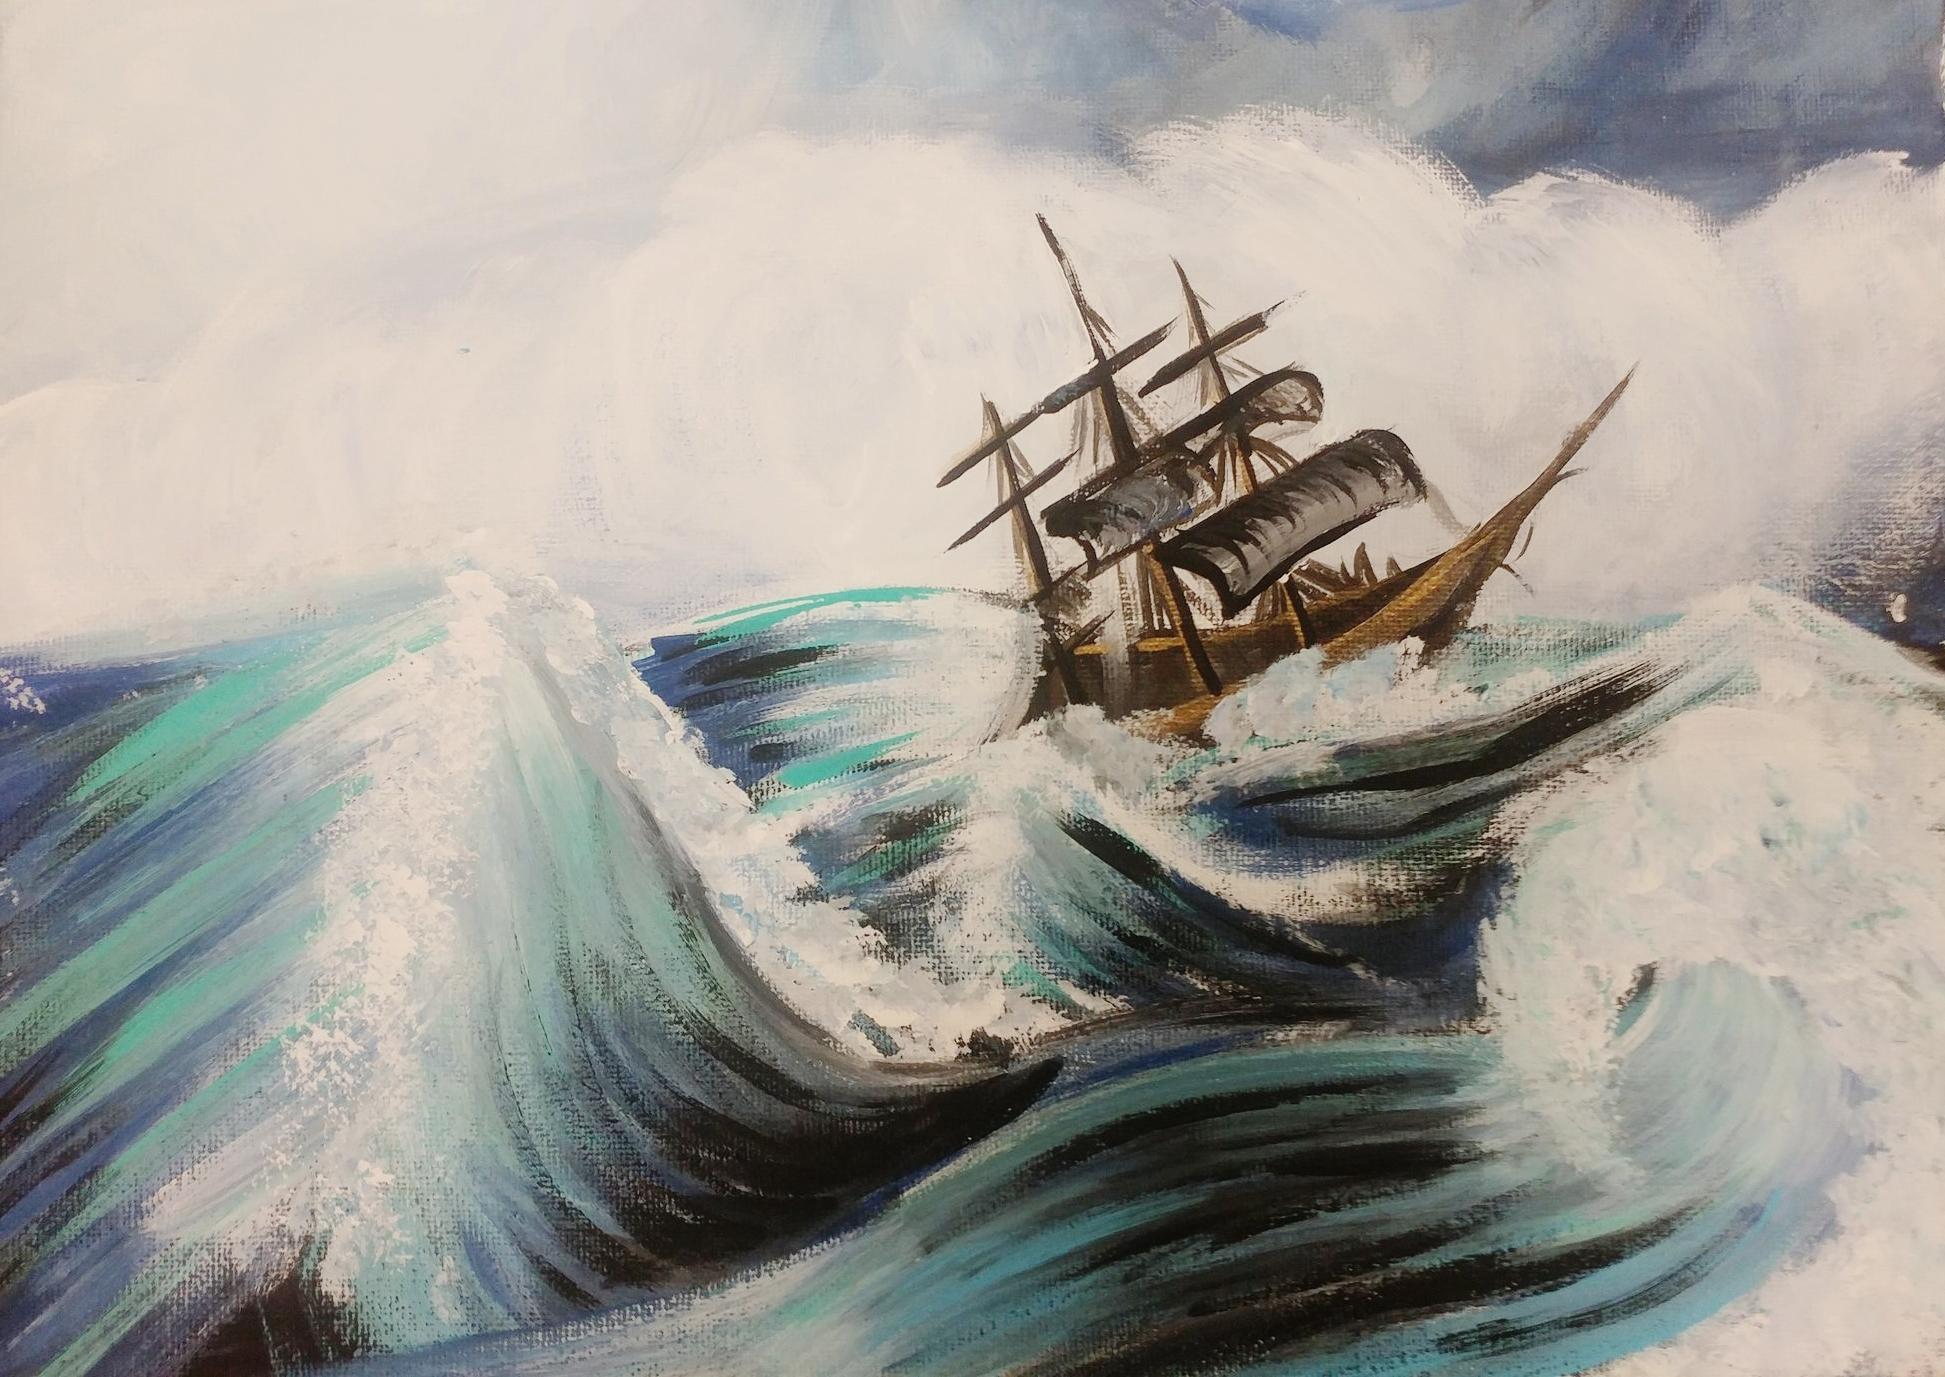 Mobile Escape Room battleship